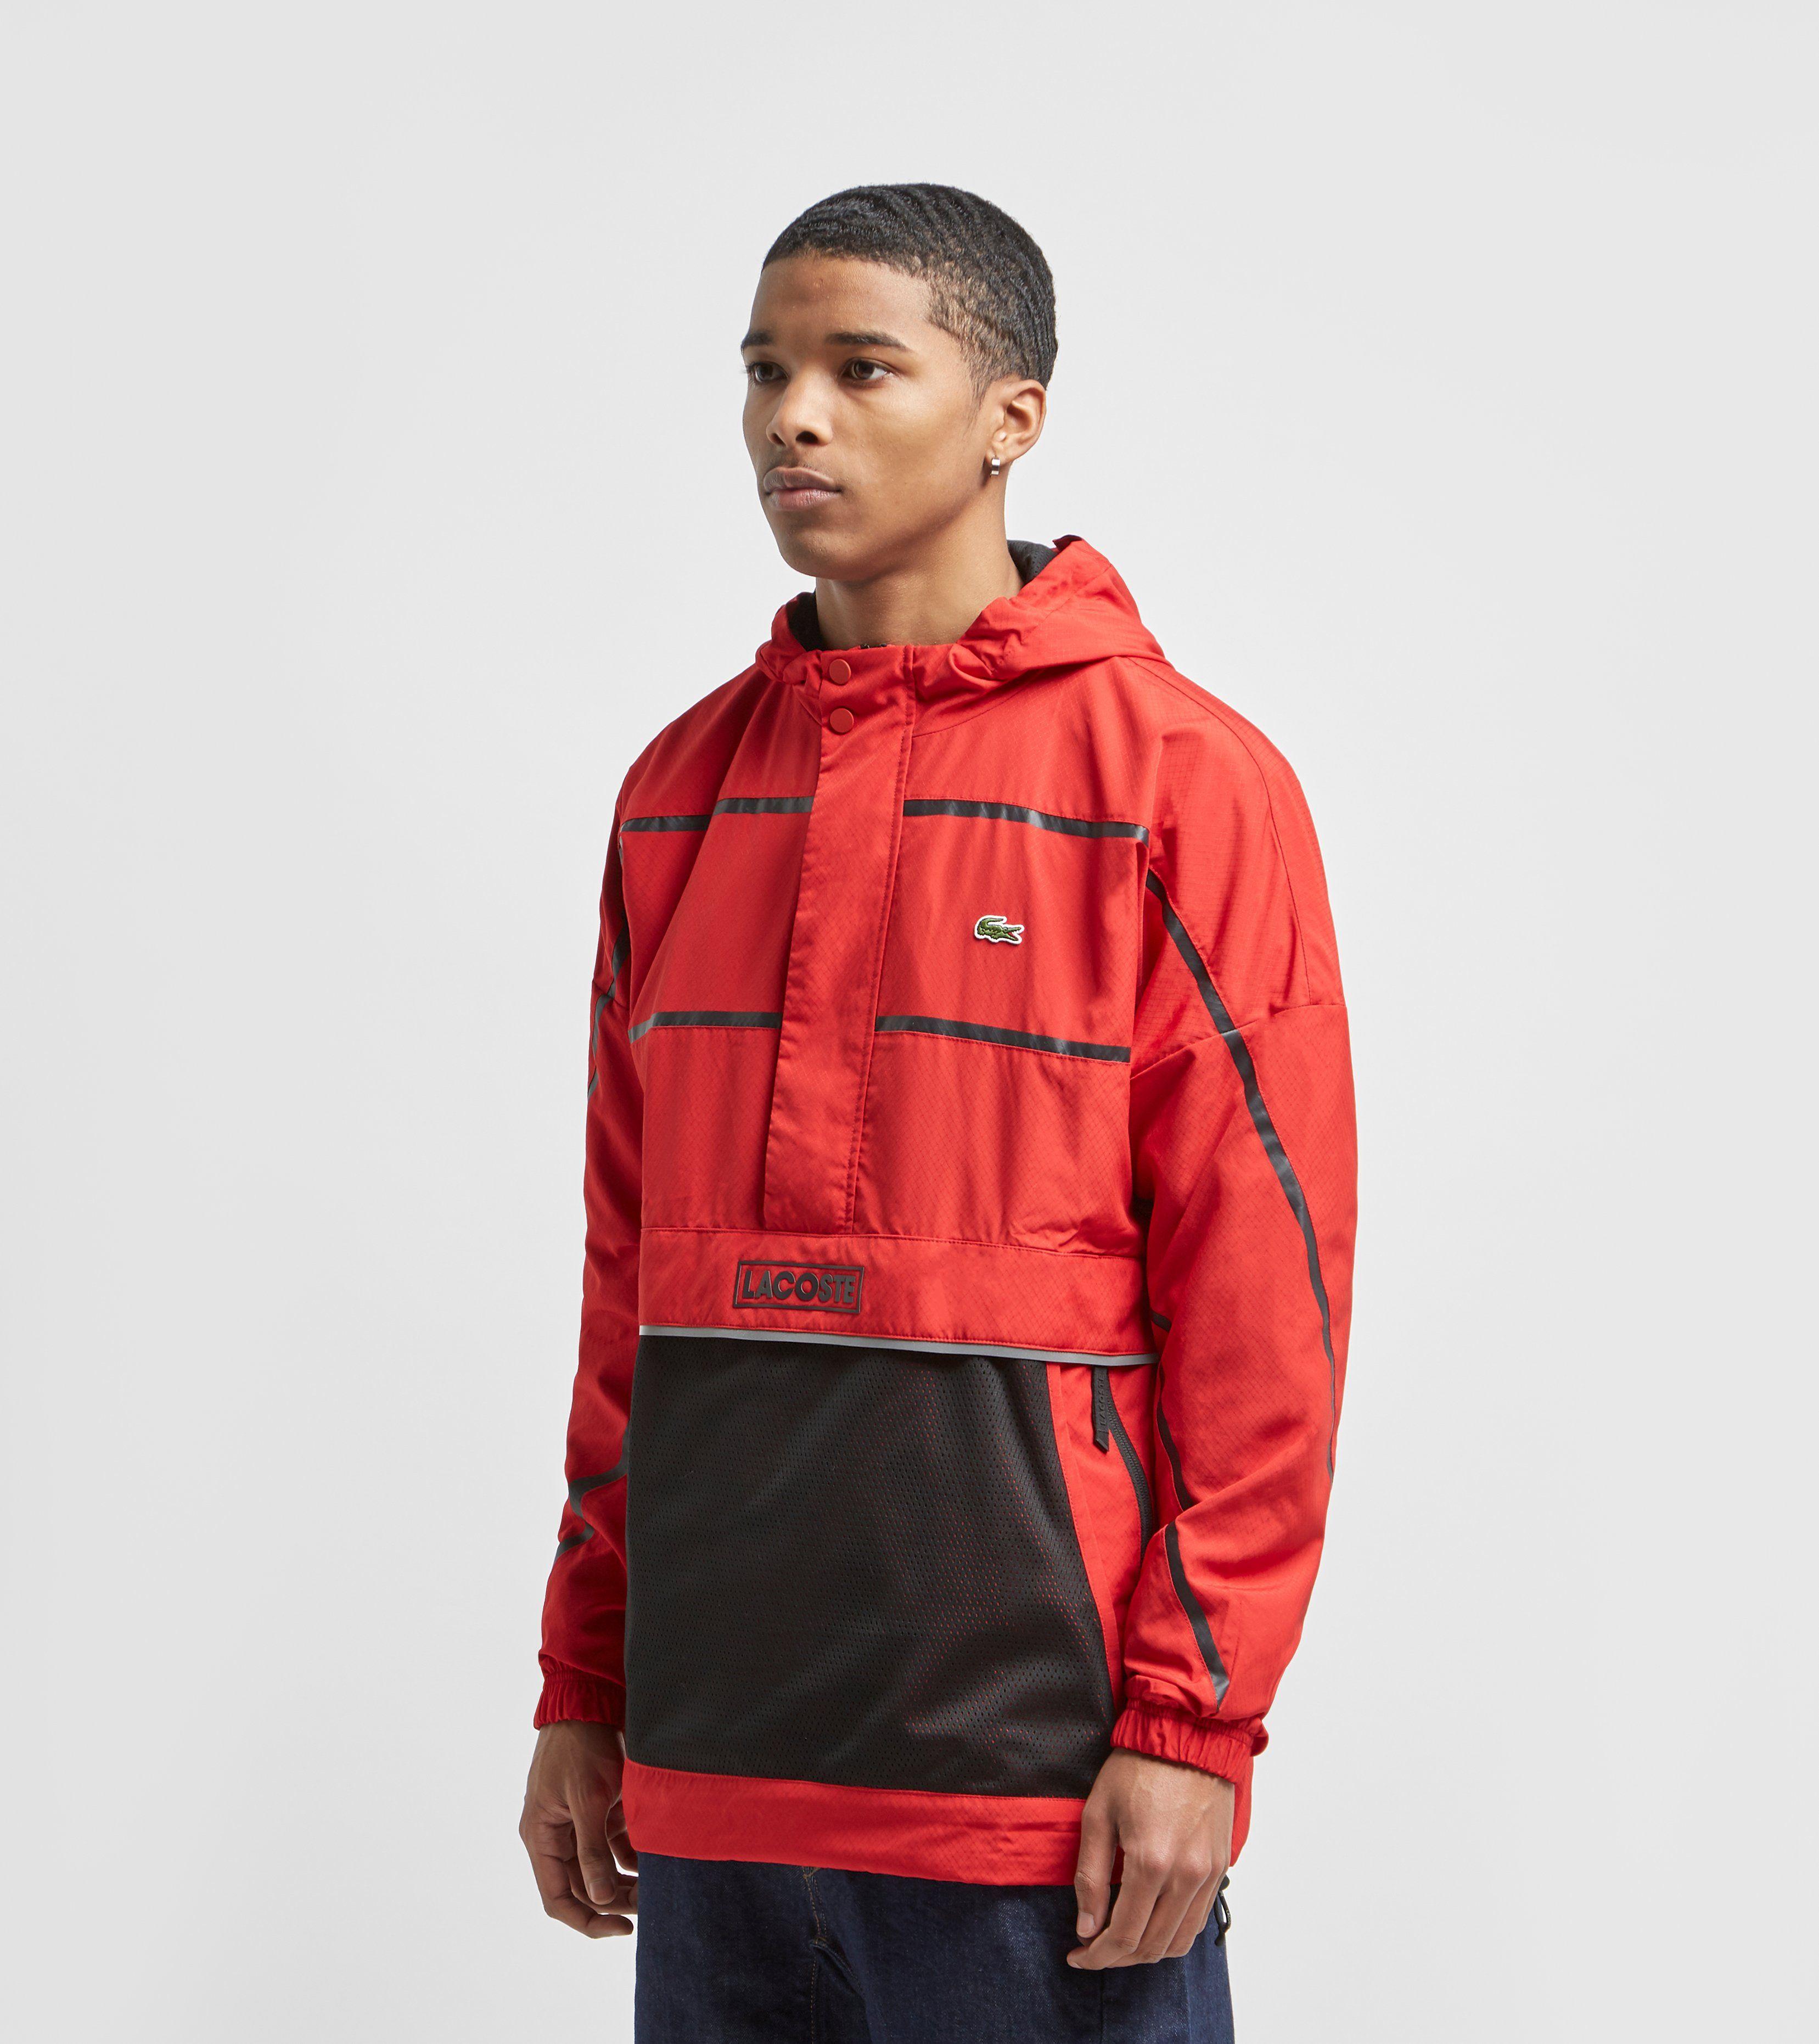 Lacoste Half-Zip Pullover Jacket